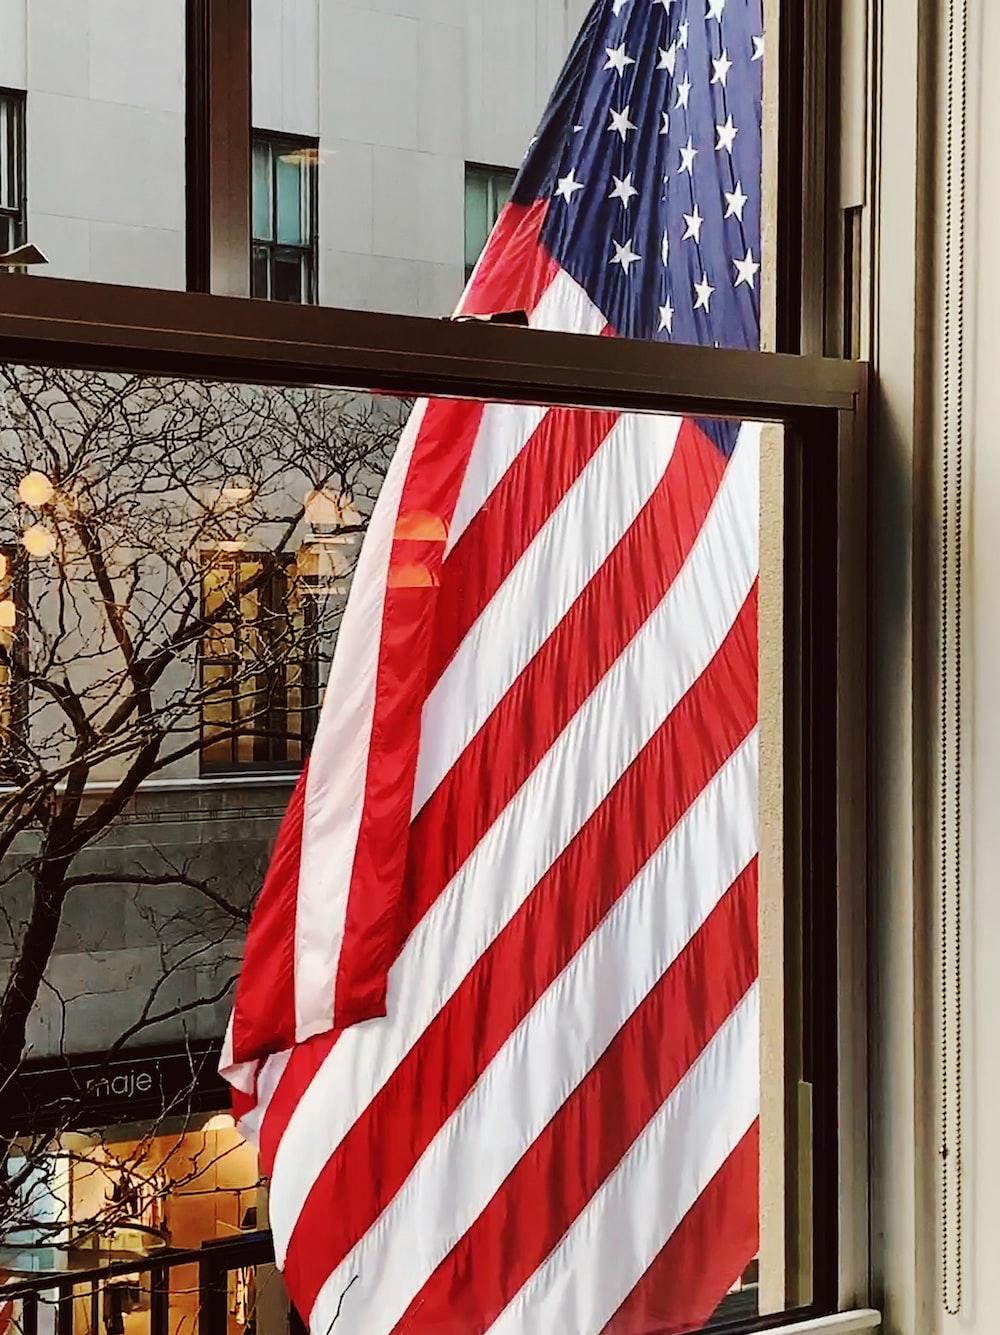 American flag outside window